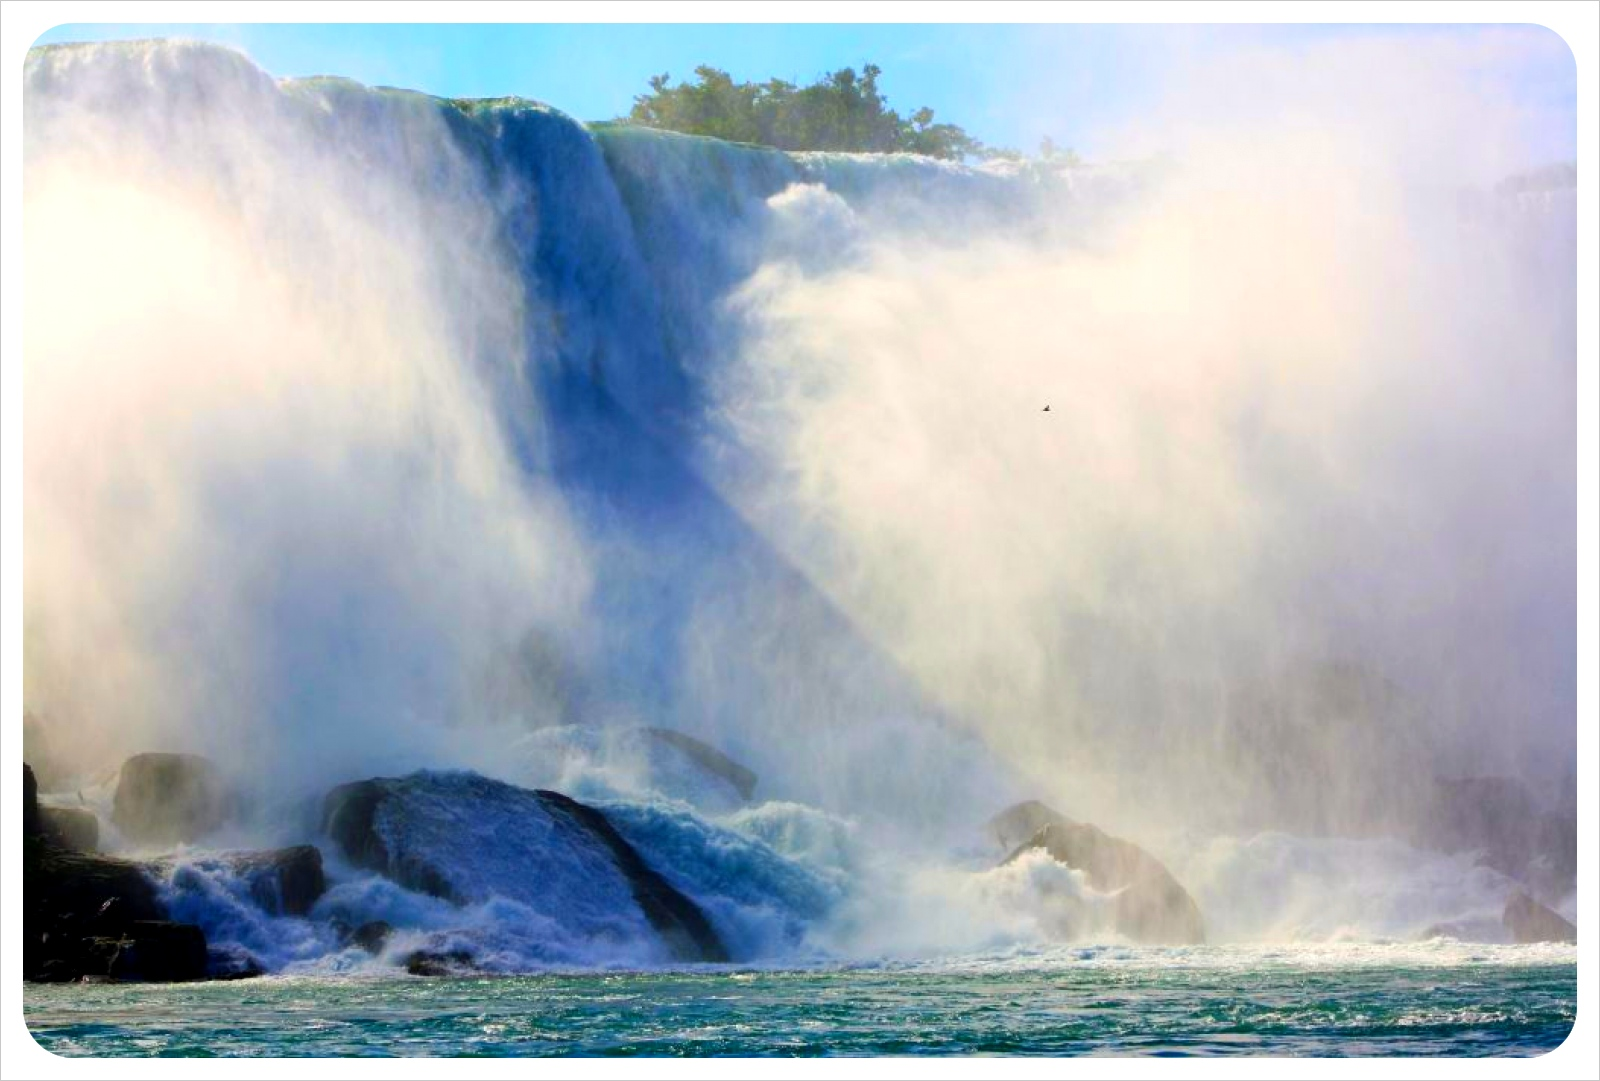 niagara falls american falls &mist from river